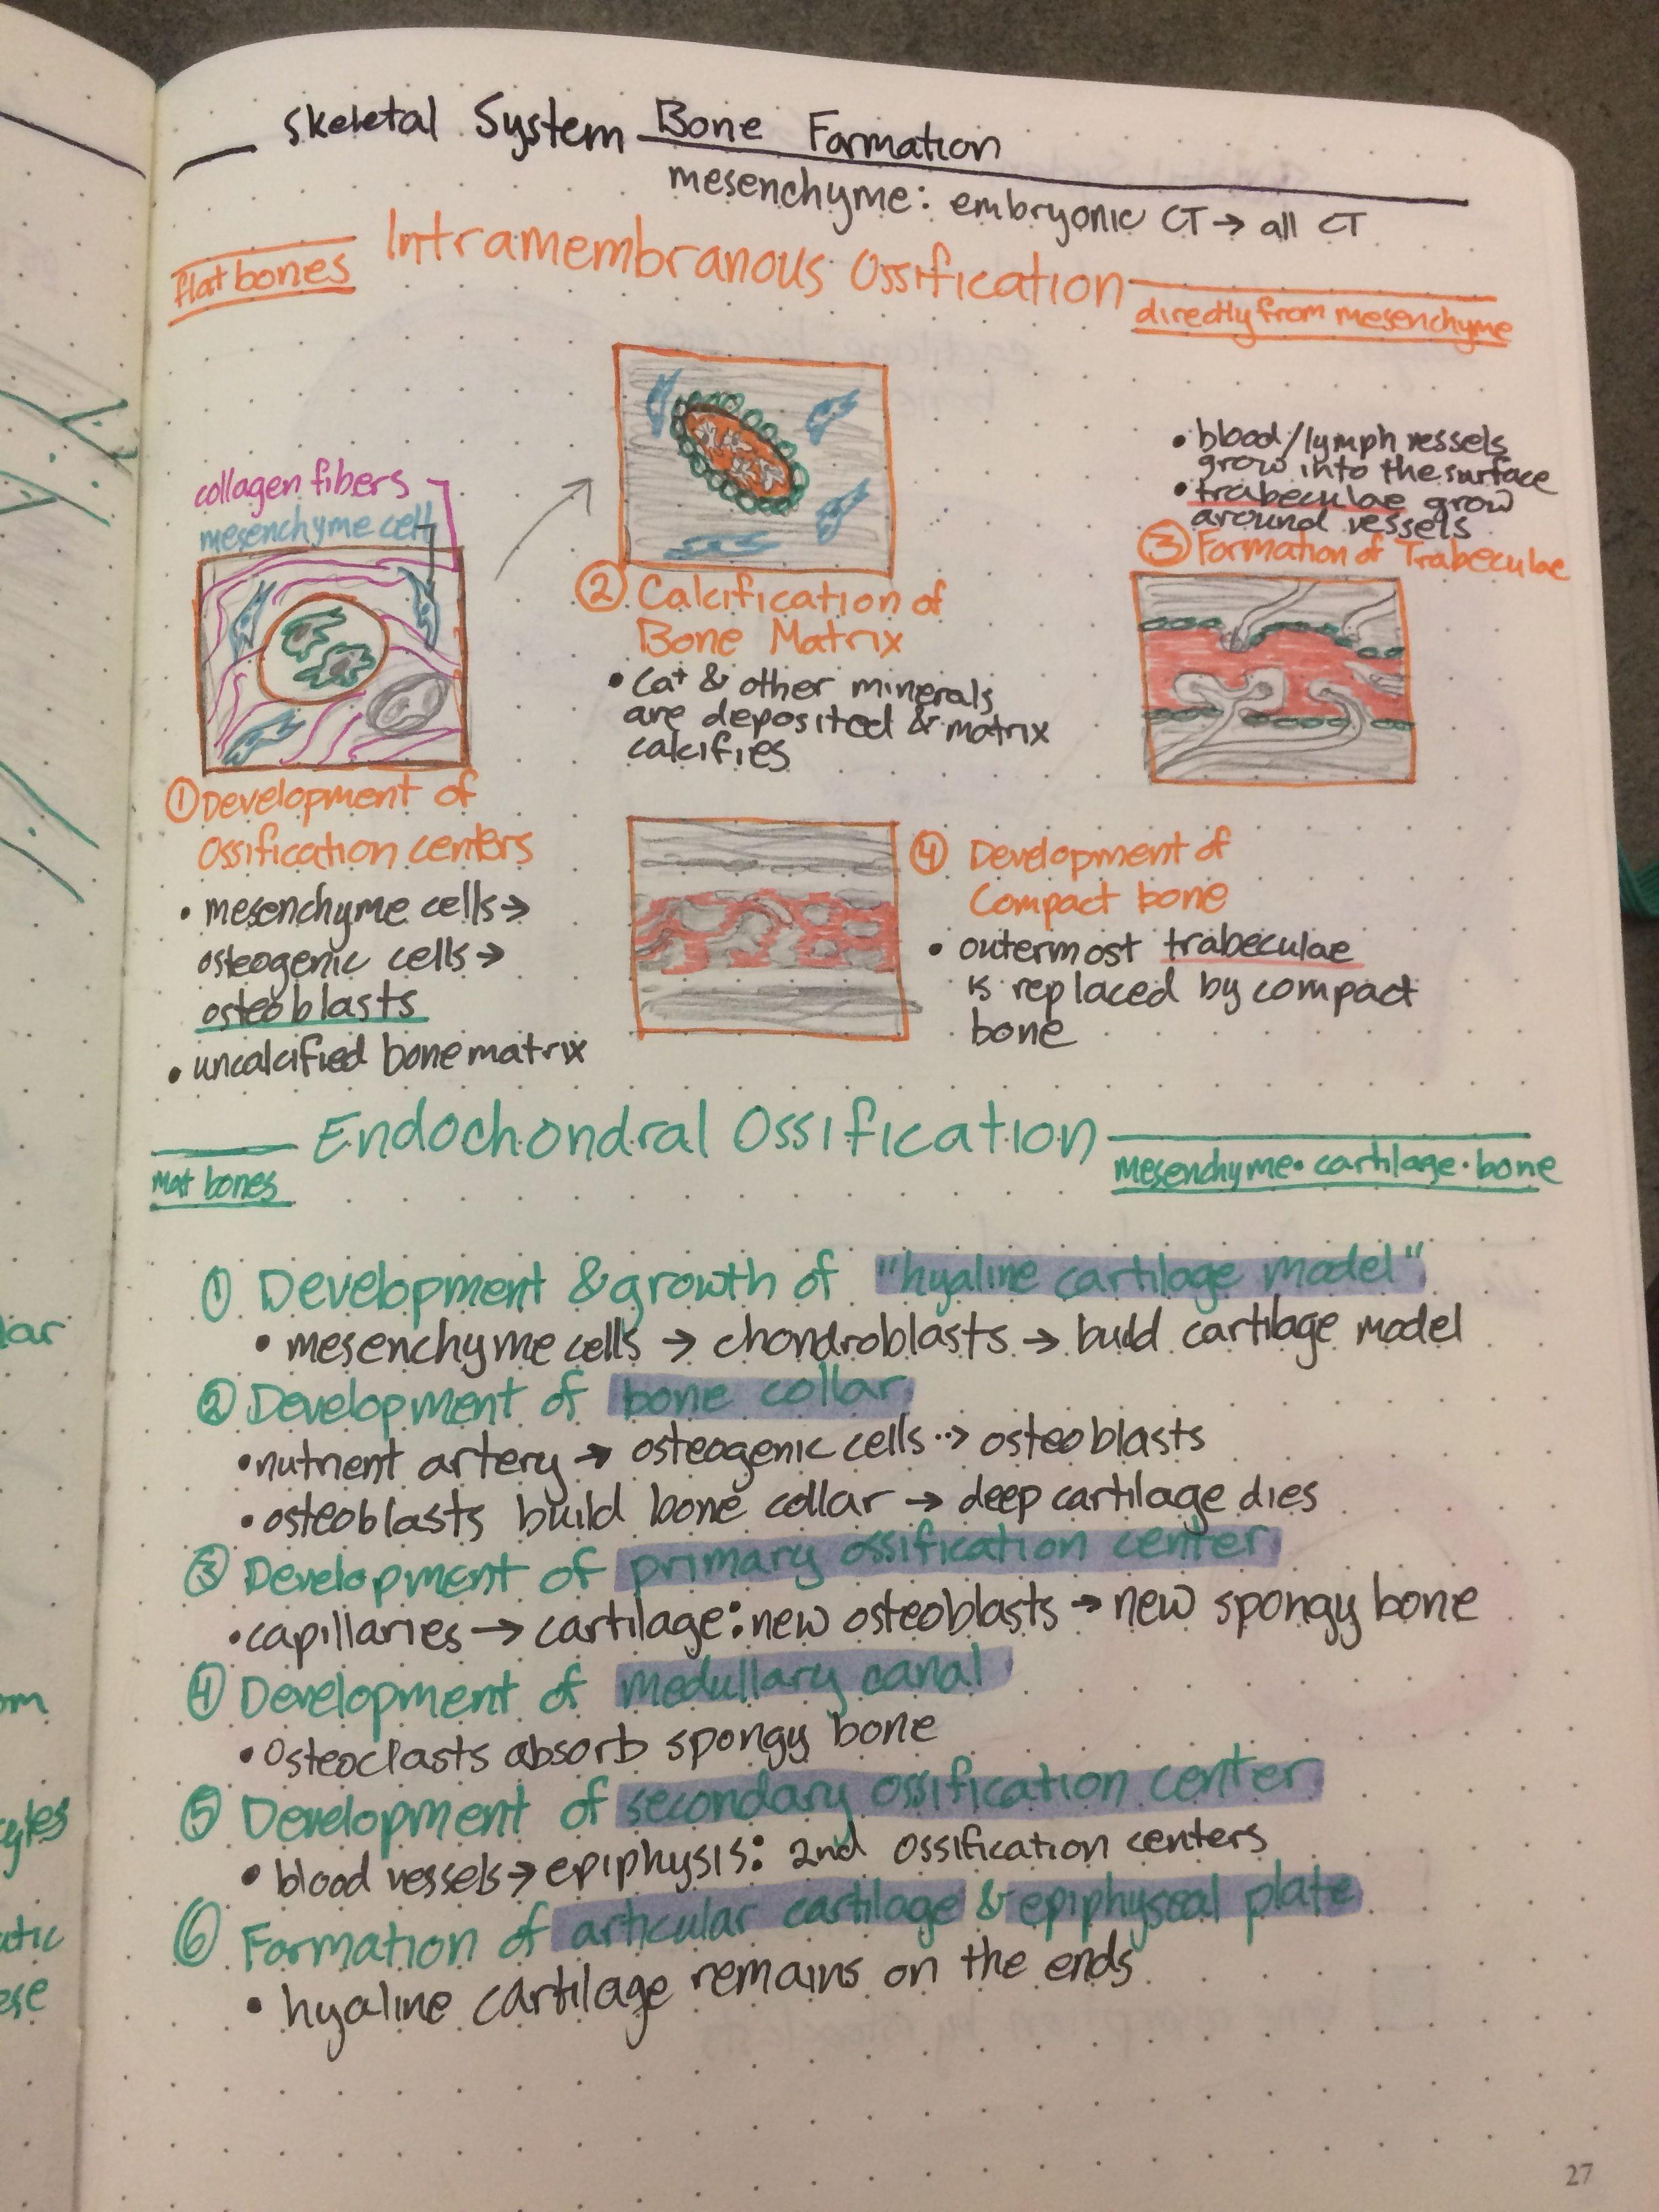 Skeletal System Bone Formation Nursing School Notes Biology Notes Nursing Notes